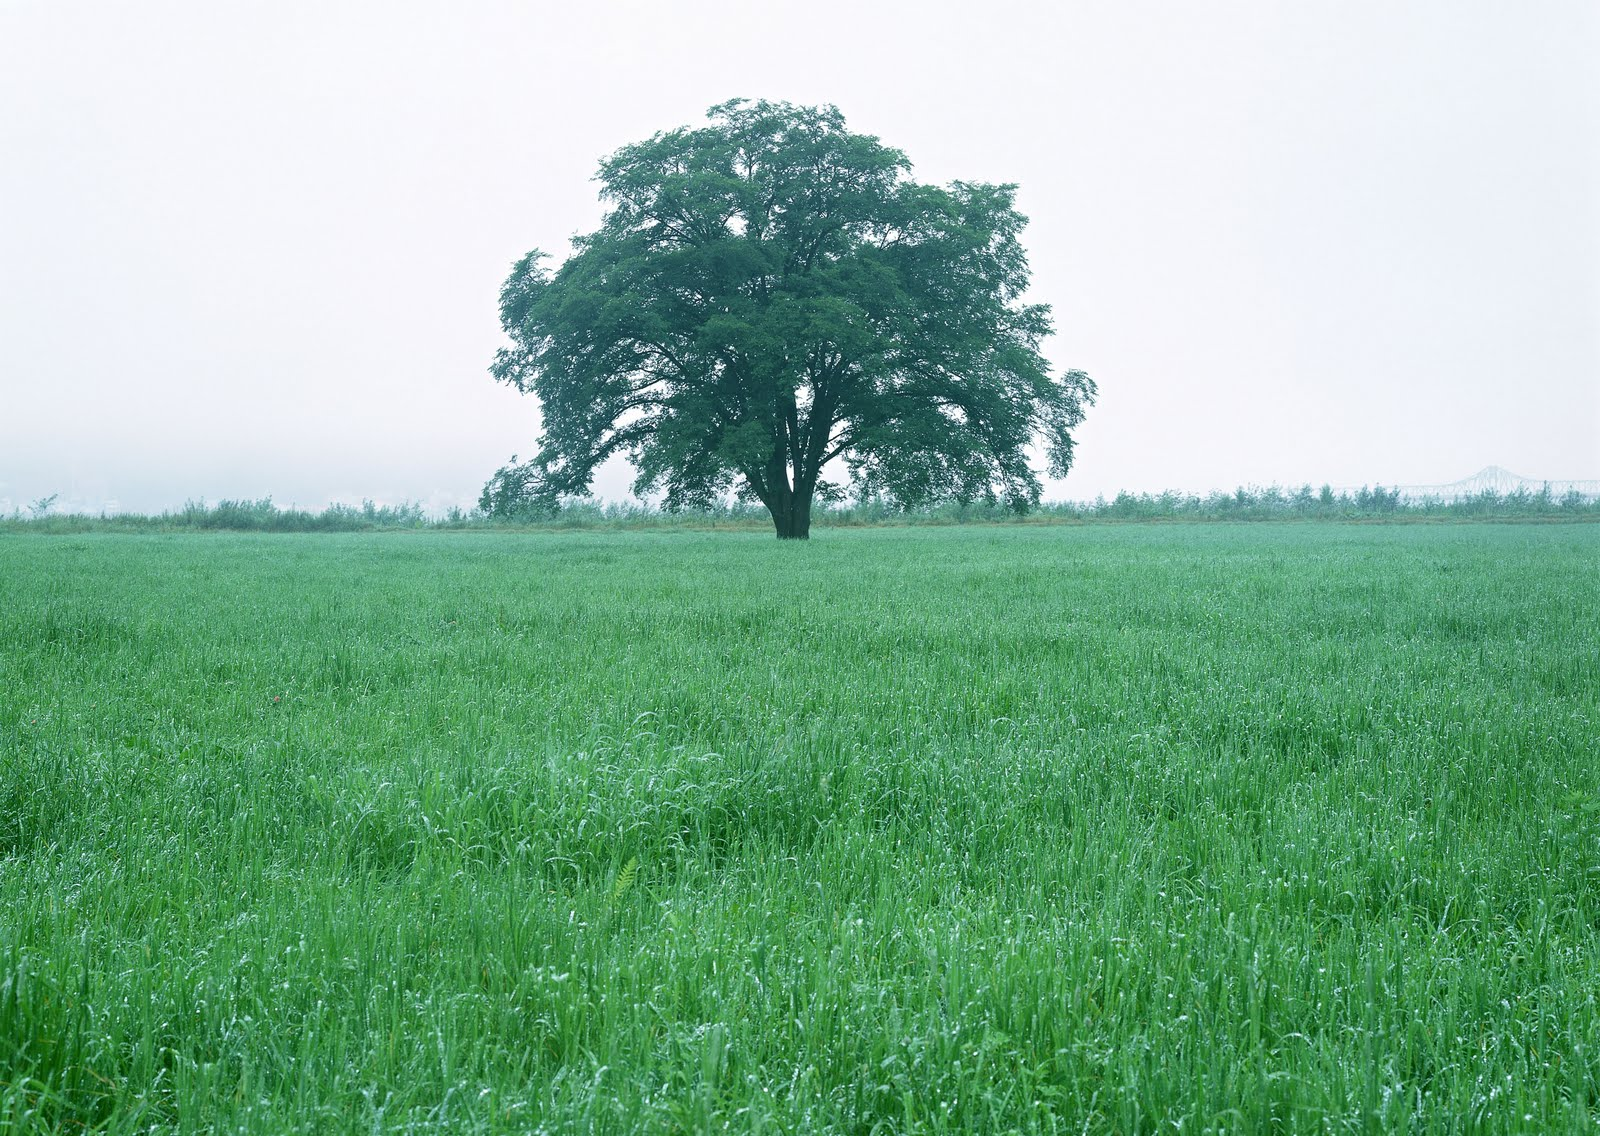 http://2.bp.blogspot.com/_rGZ14Dv3CBU/S92g_Dl63LI/AAAAAAAAA-4/cDKUwMOPHuM/s1600/Free+Tree+Wallpaper+%2842%29.JPG